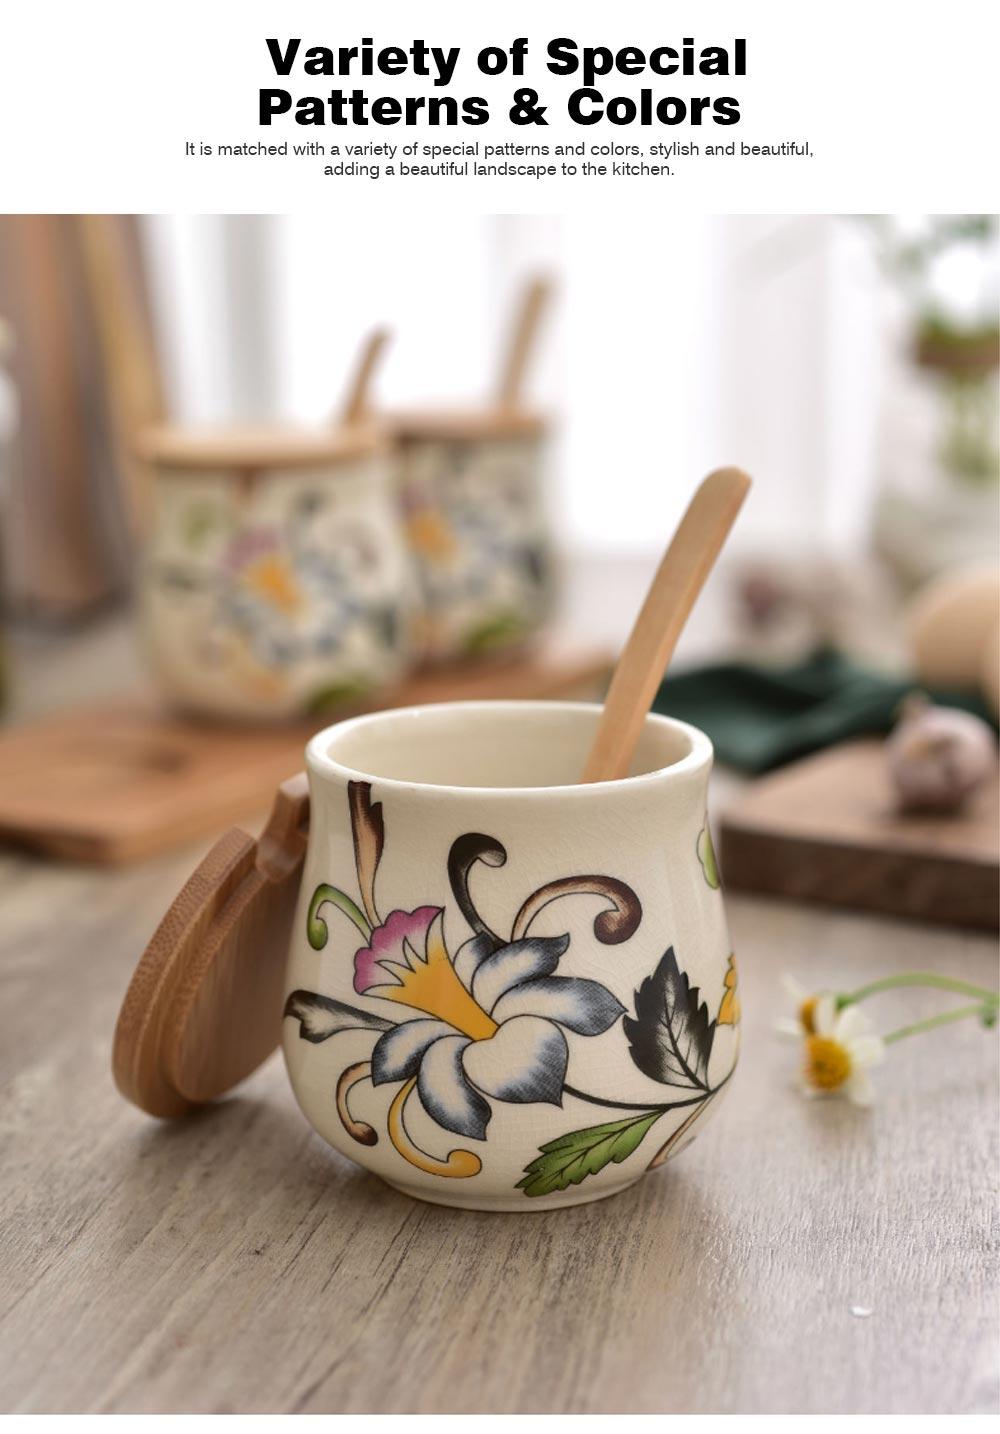 Three-piece Ceramic Seasoning Jar Set, Bamboo and Wood Ceramic Seasoning Bottle Set, with Wood Bracket 6